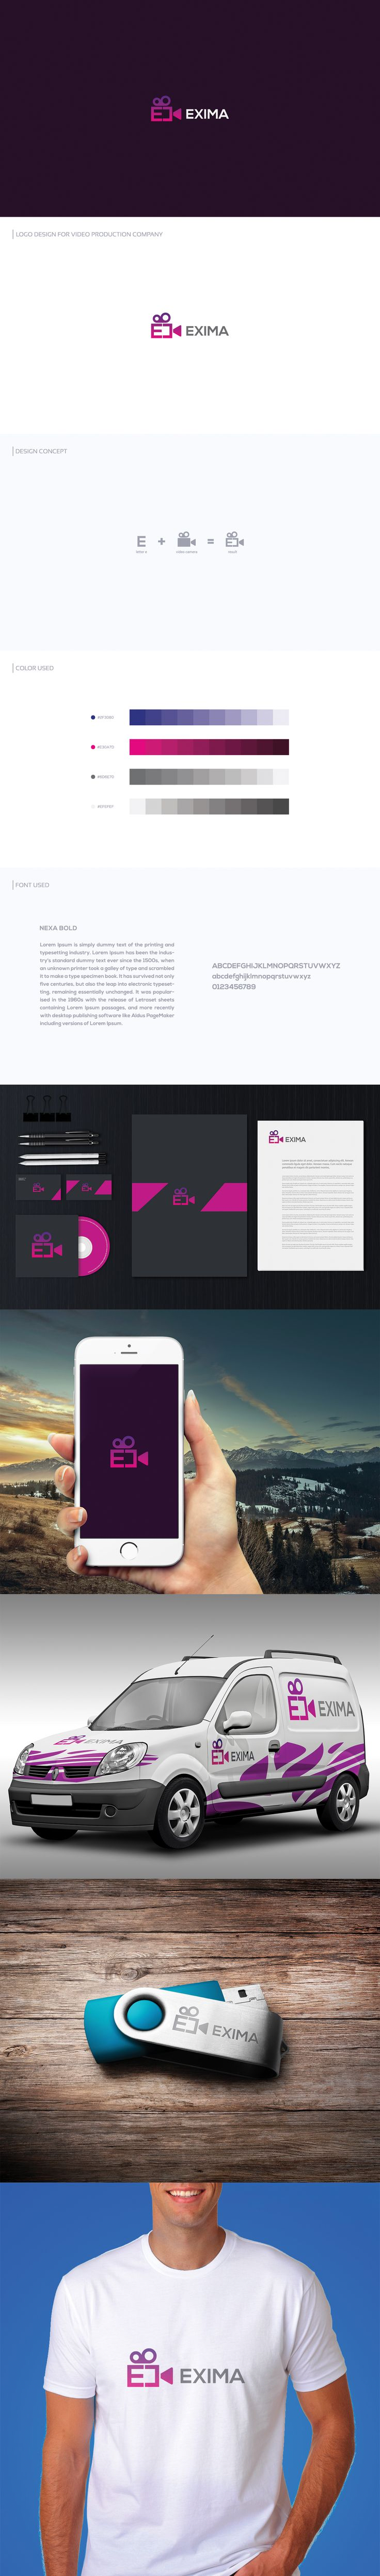 Video production company logo on Behance